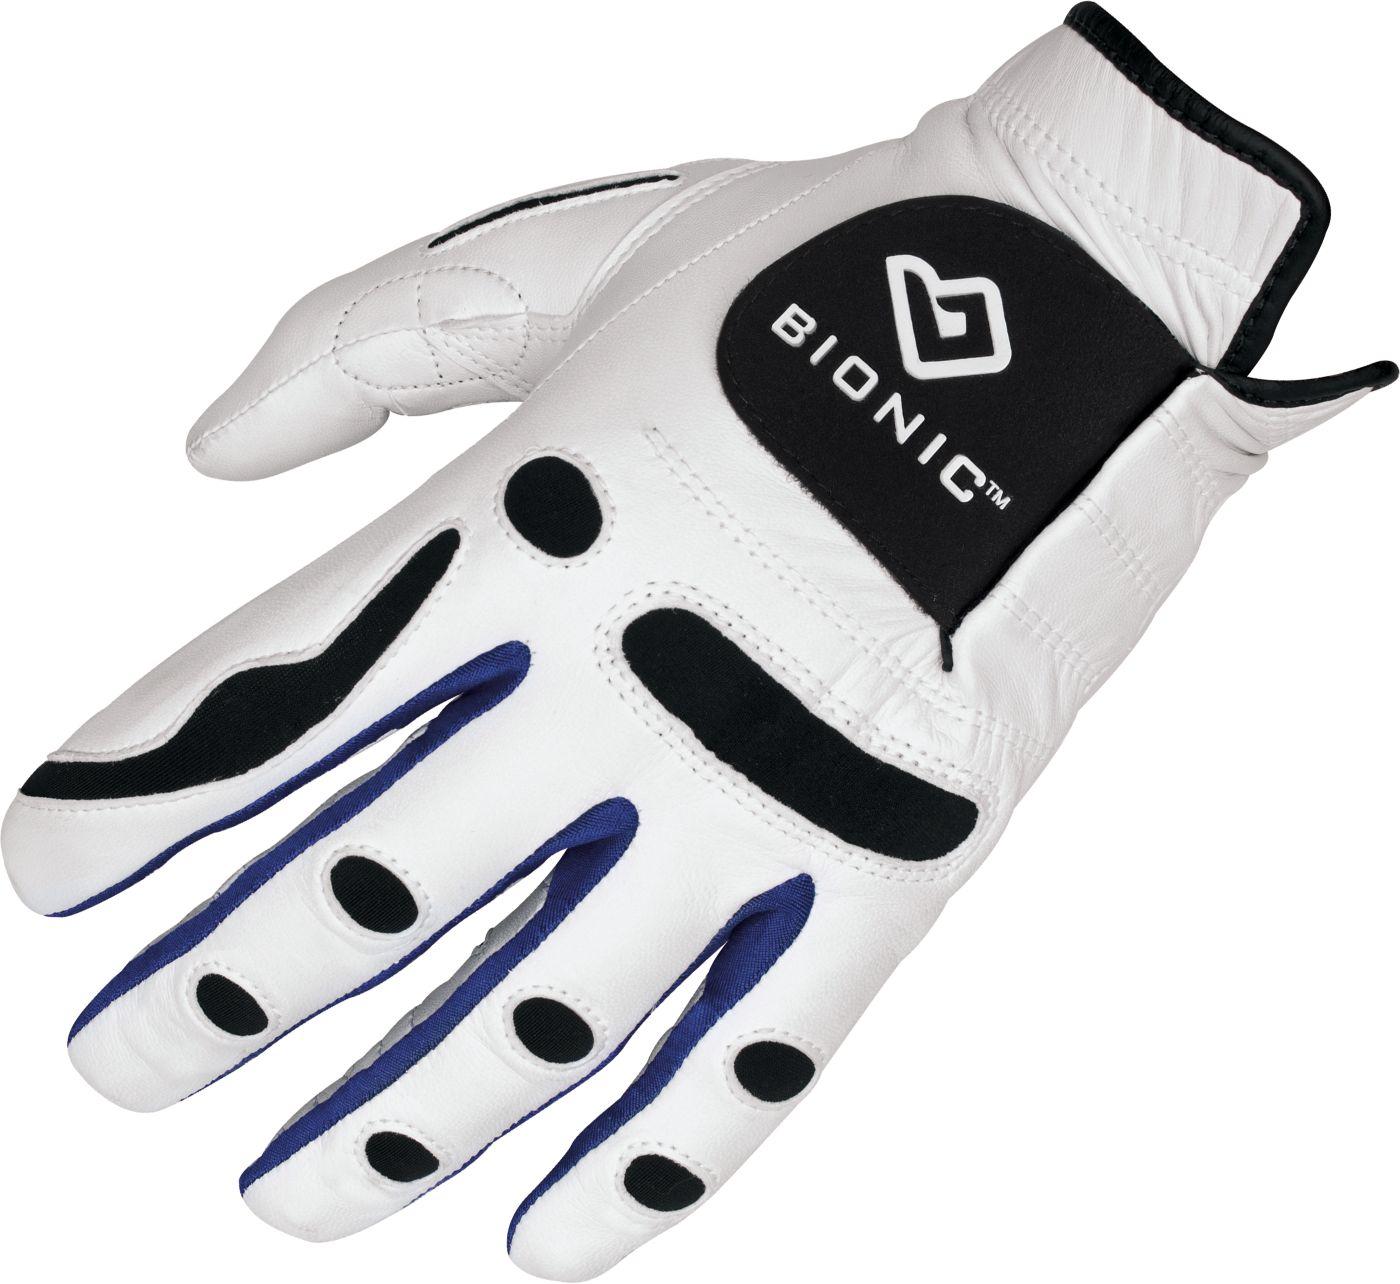 Bionic PerformanceGrip Golf Glove